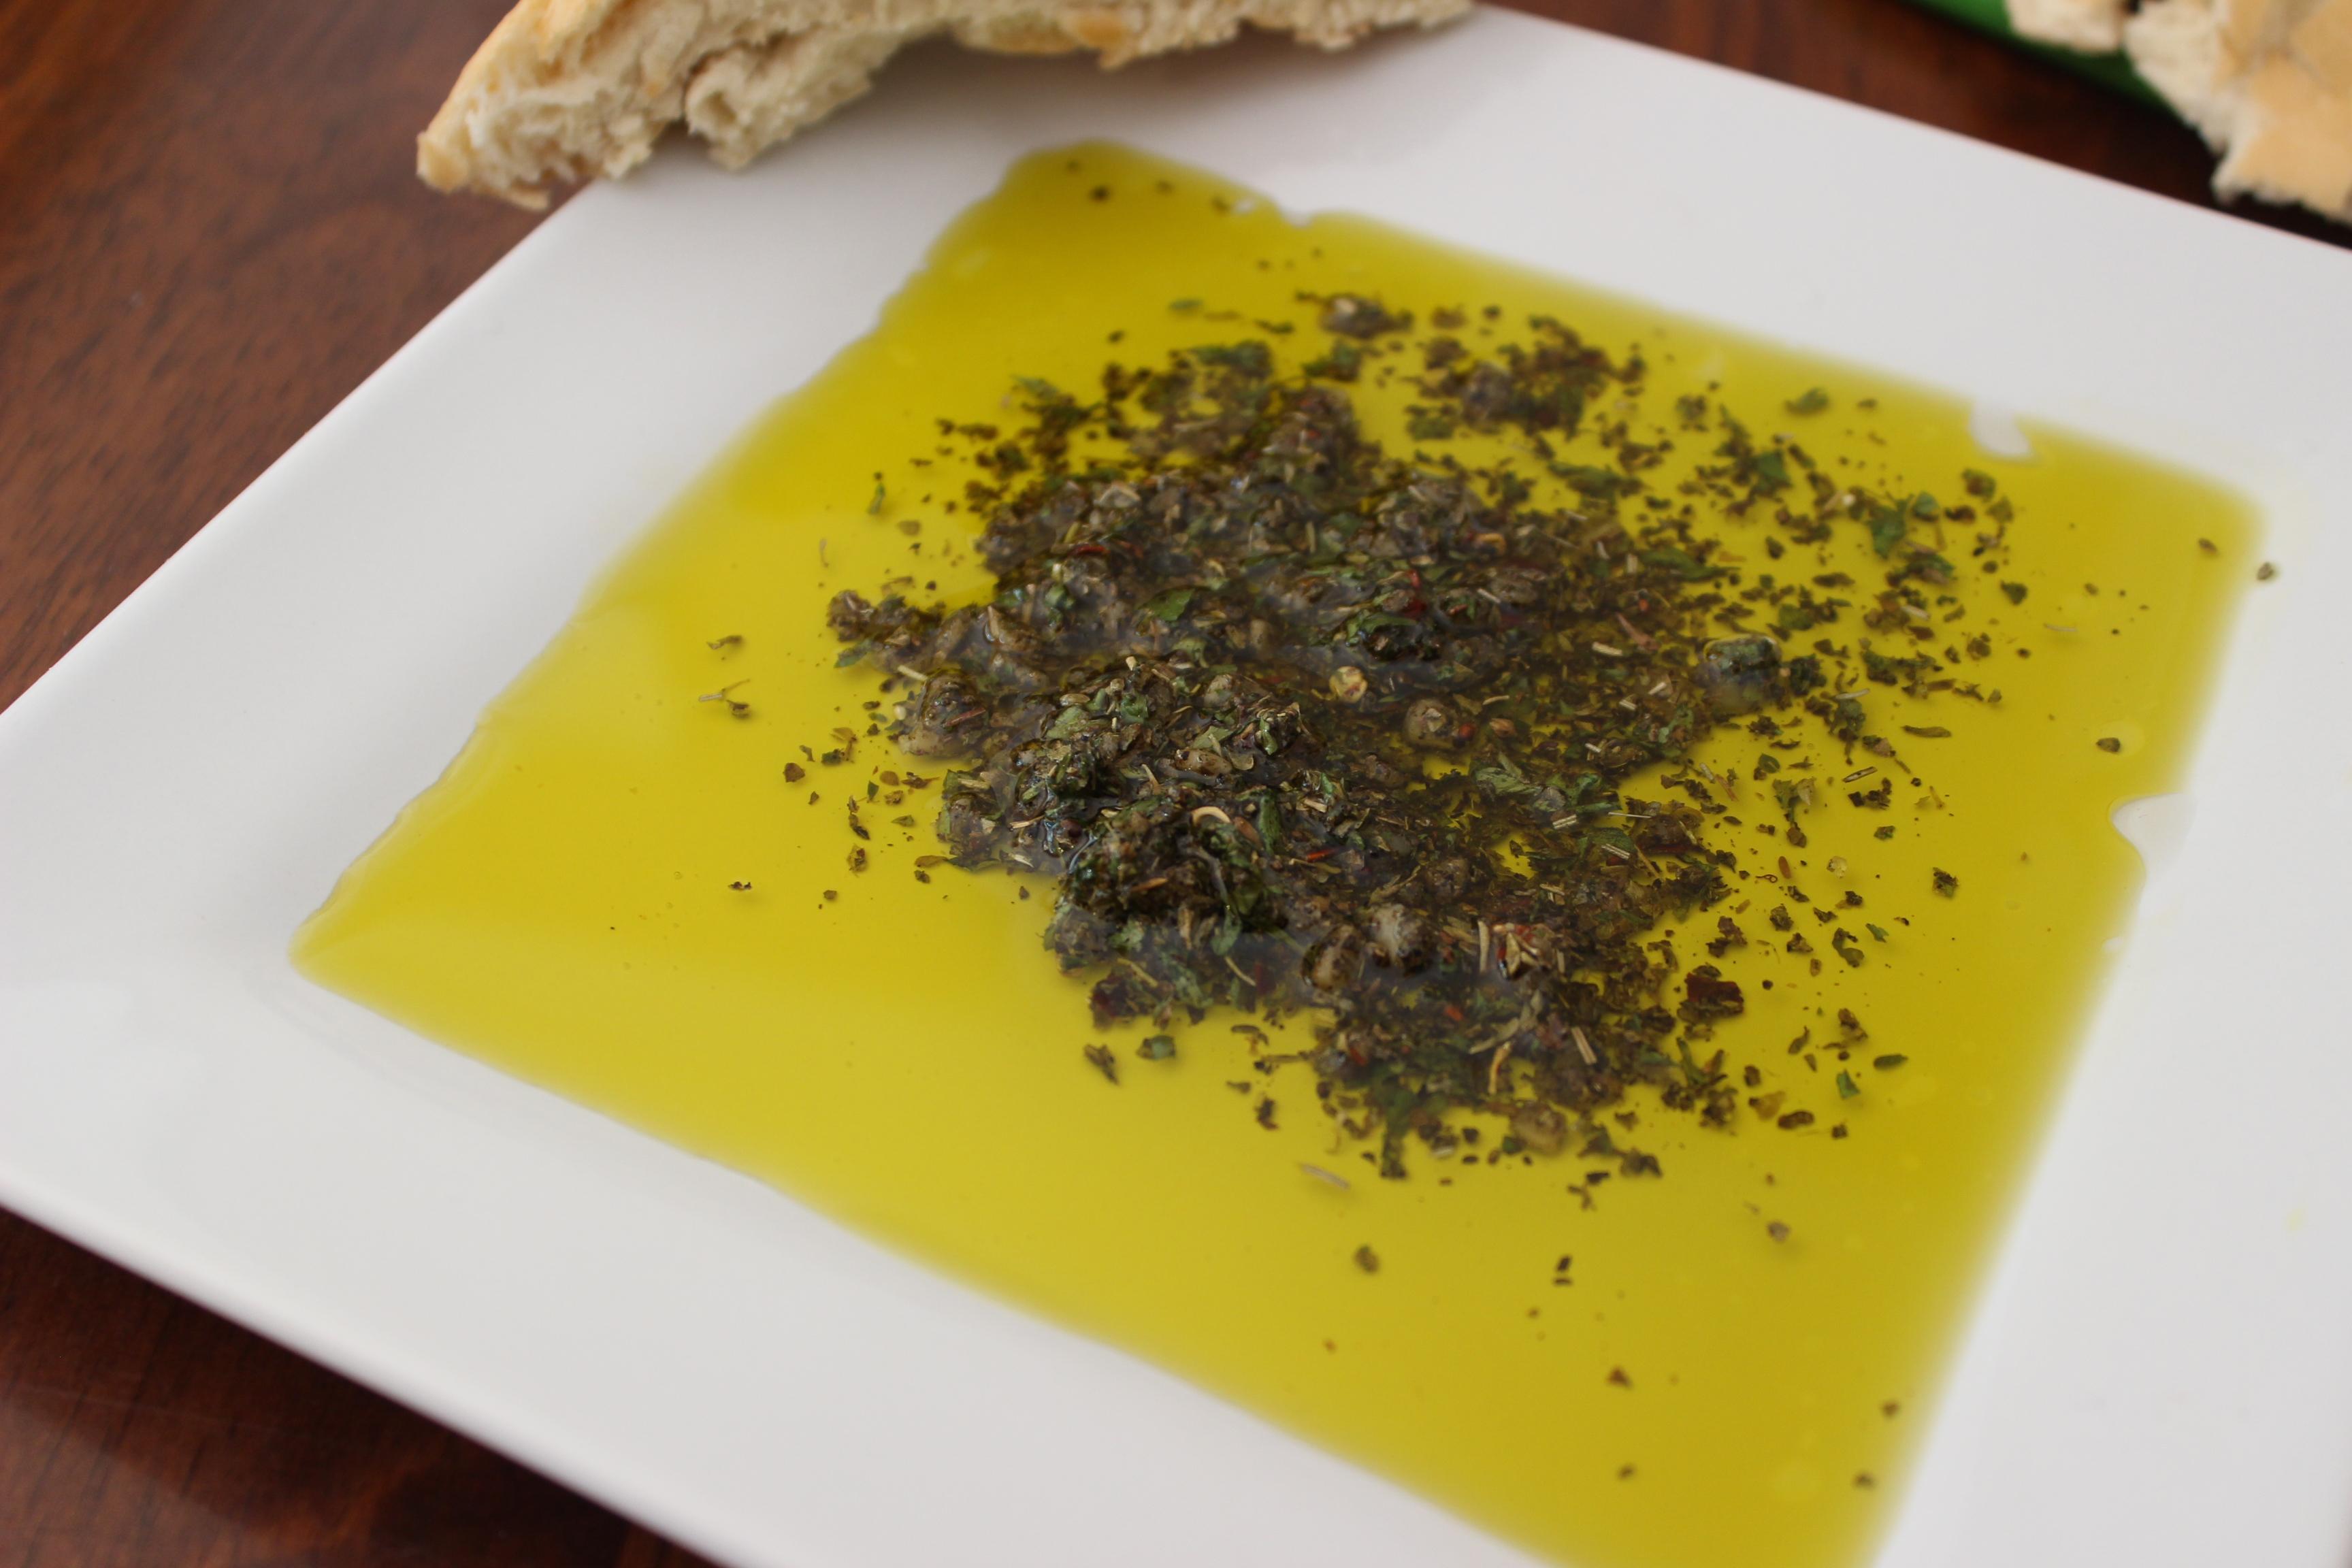 TSR Version of Carrabba's Bread Dipping Spice by Todd Wilbur Recipe